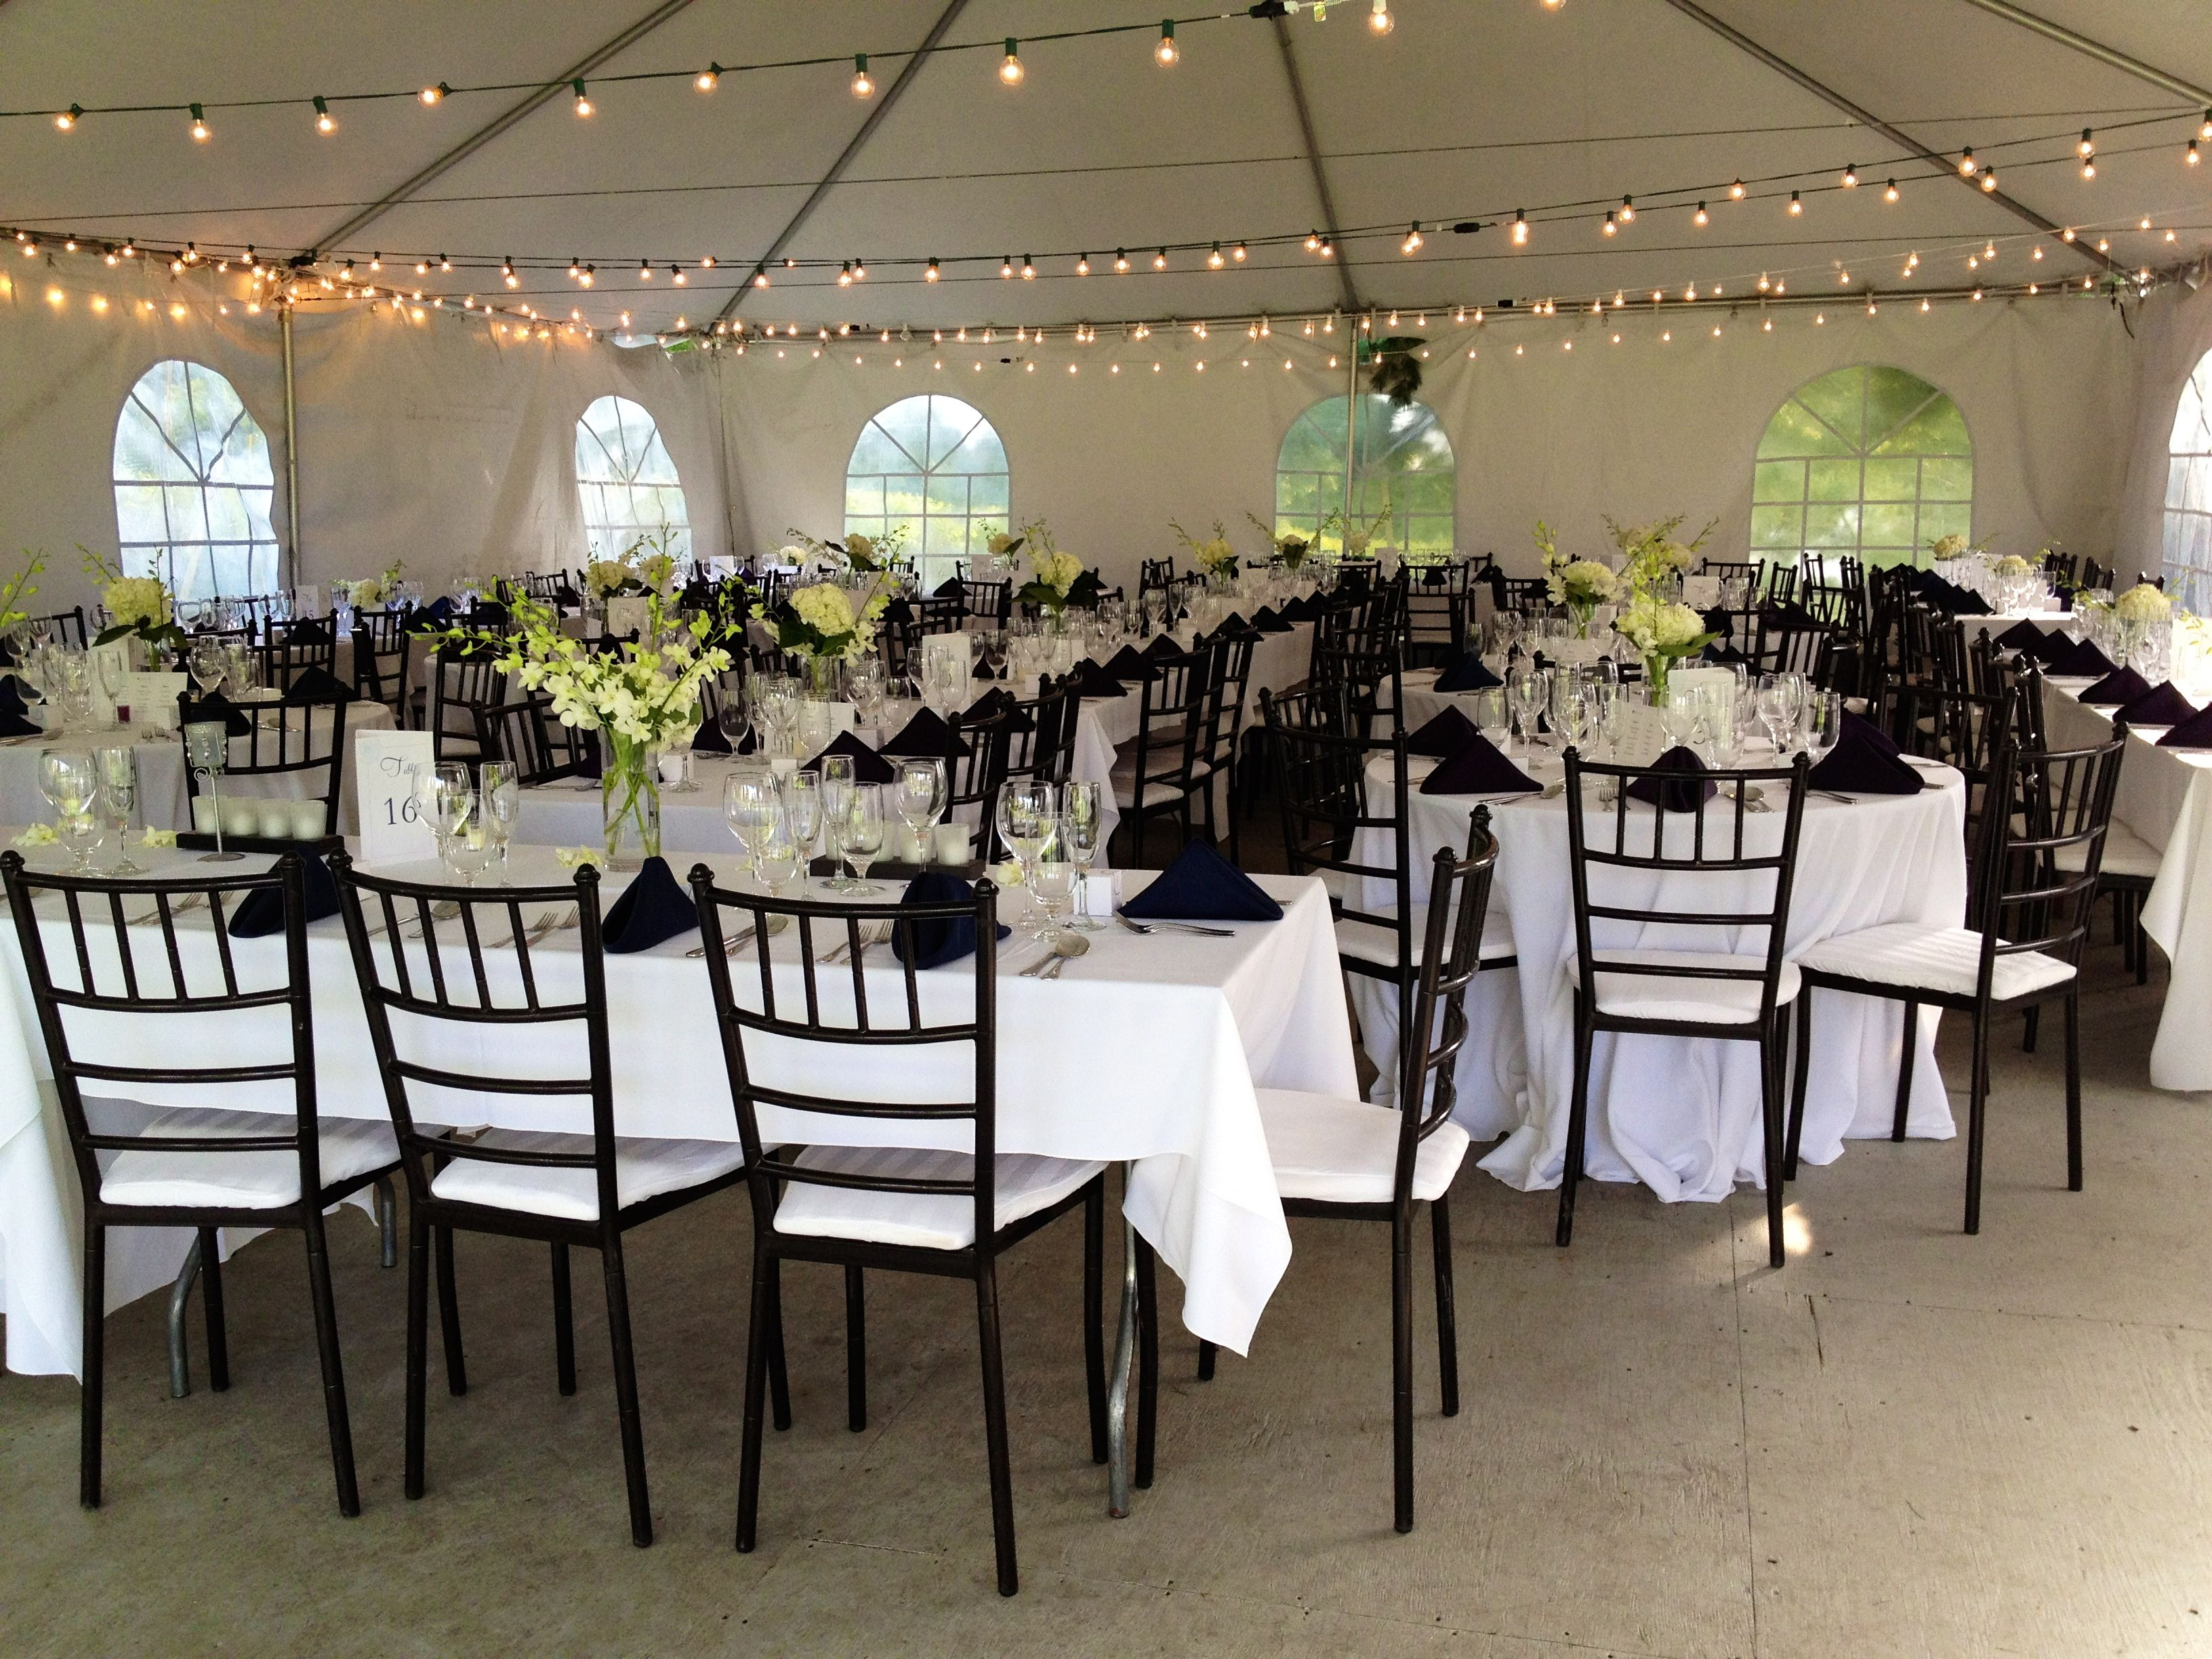 Marriott International Ottawa Wedding Venue Complements Dream Weddings With Free Honeymoon Offer